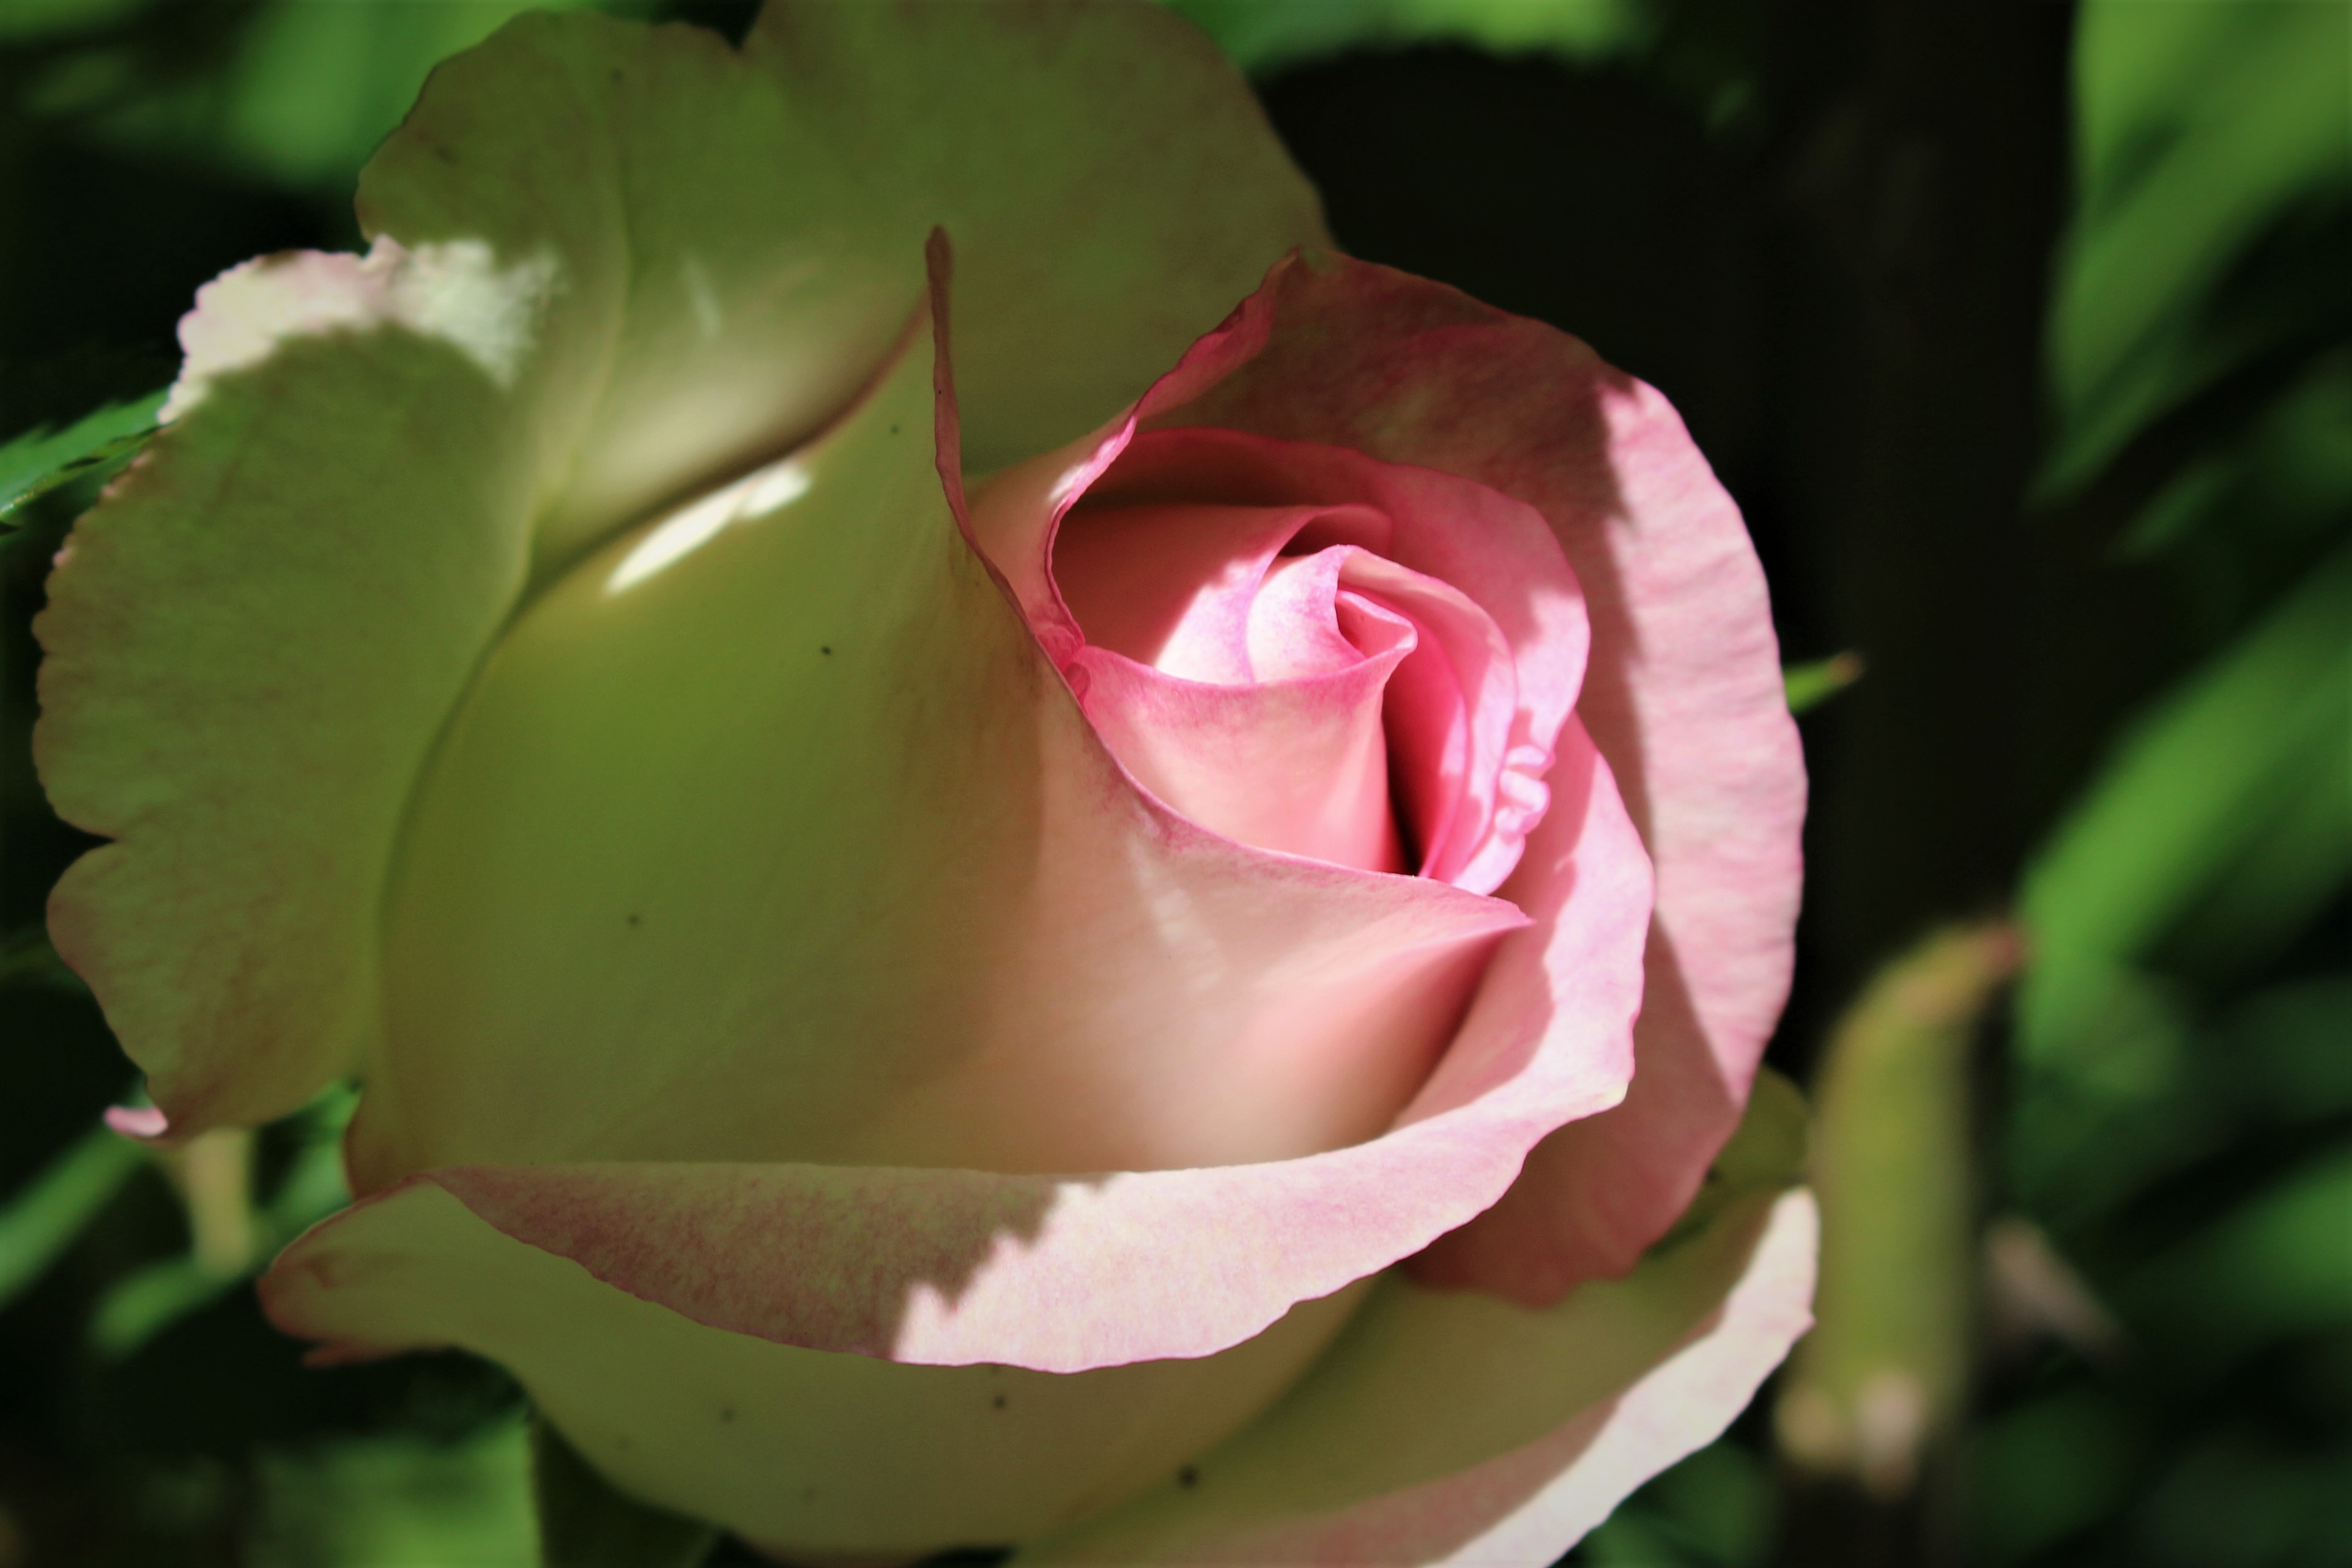 Pink rose, morning sun - Knoxville, TN